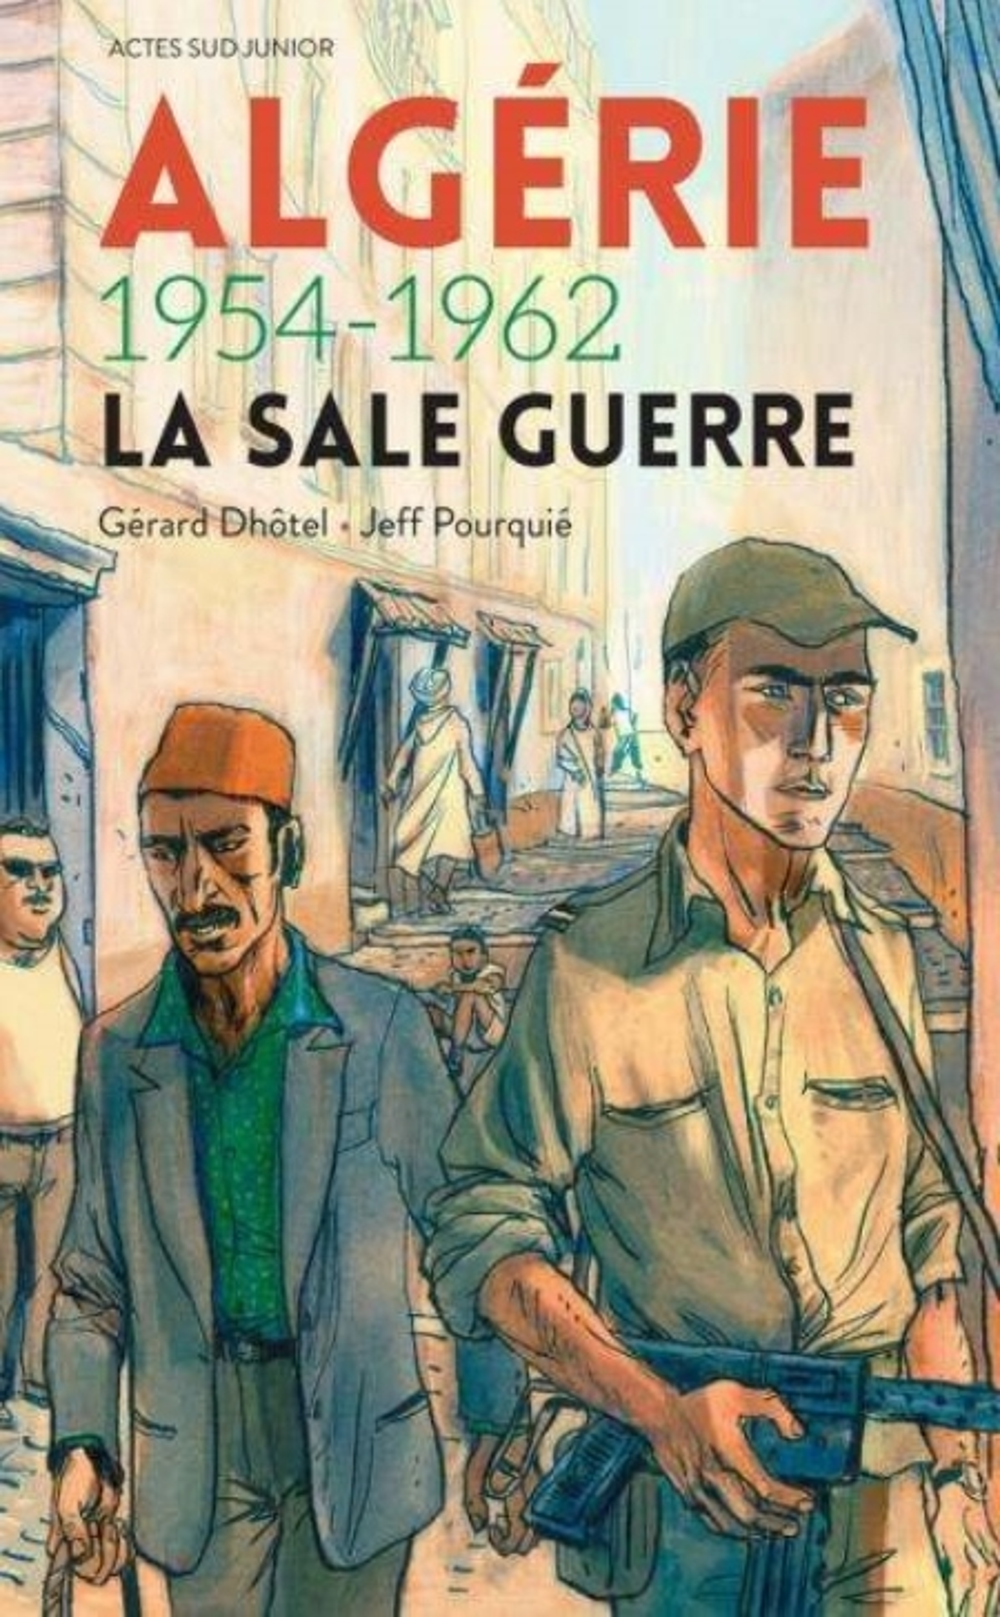 ALGERIE 1954-1962  -  LA SALE GUERRE DHOTEL GERARD Actes Sud junior